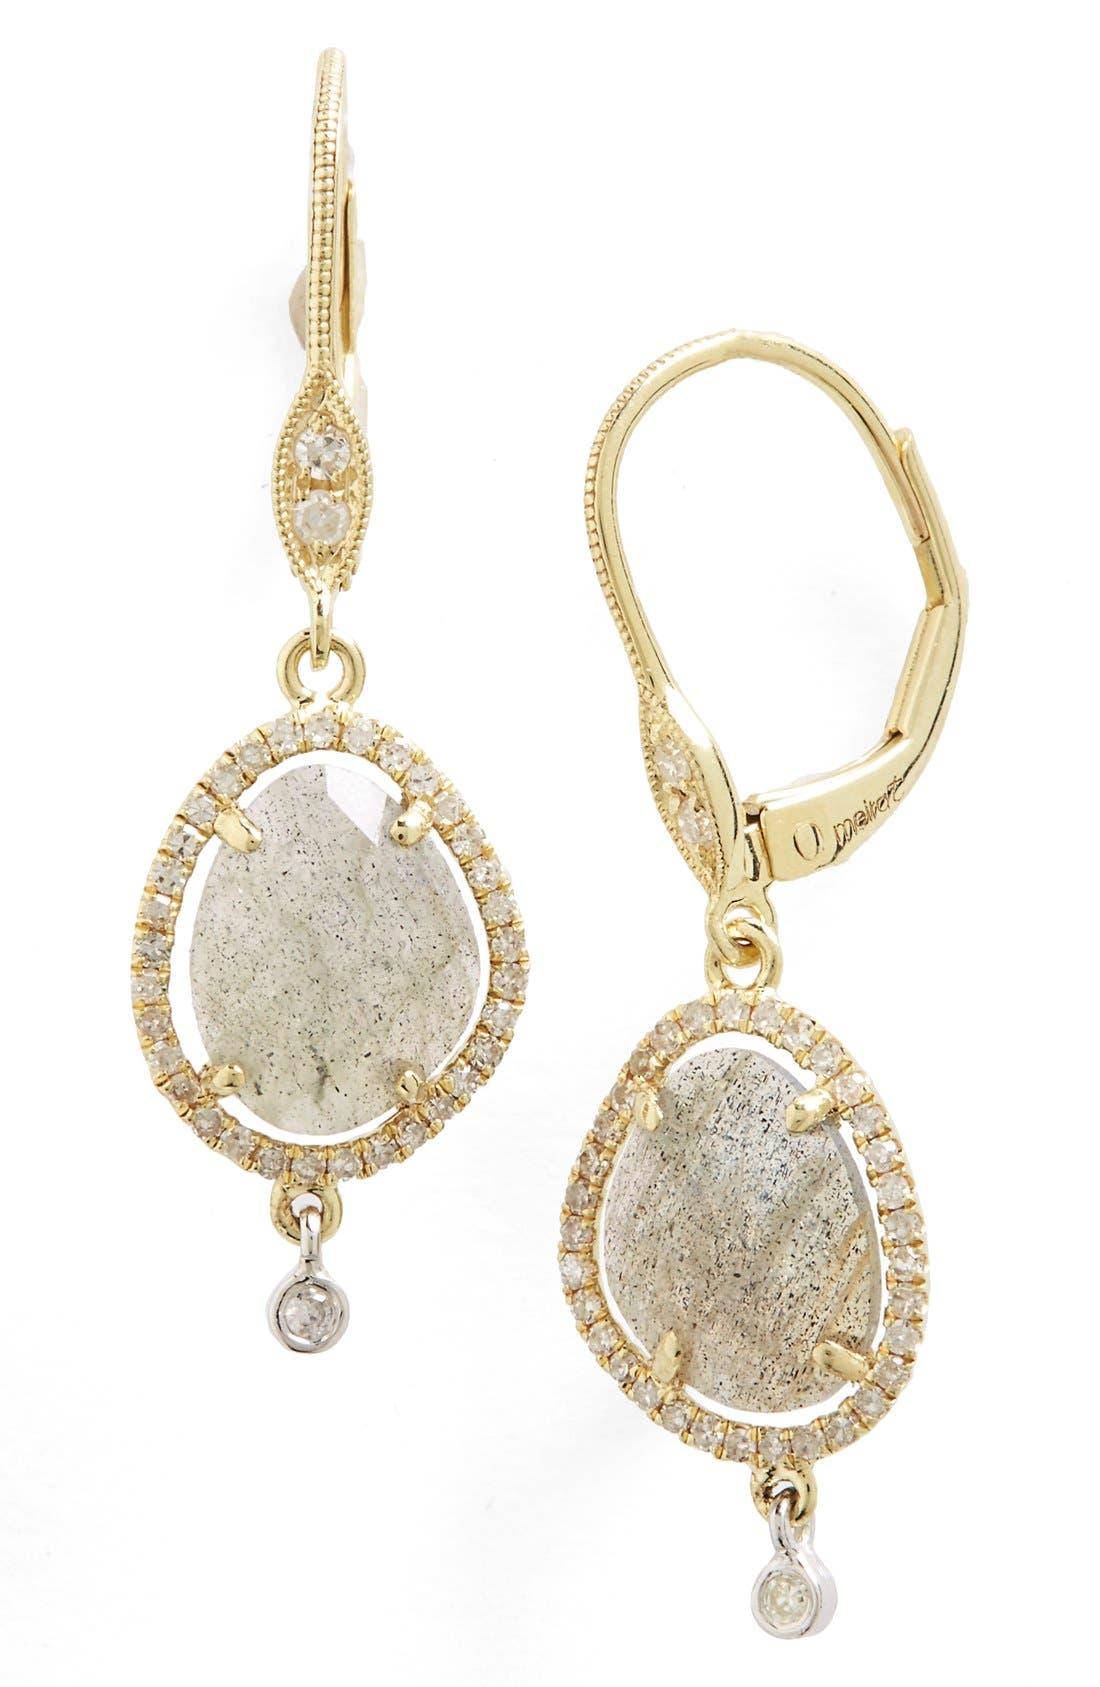 Main Image - MeiraT Diamond & Semiprecious Stone Drop Earrings